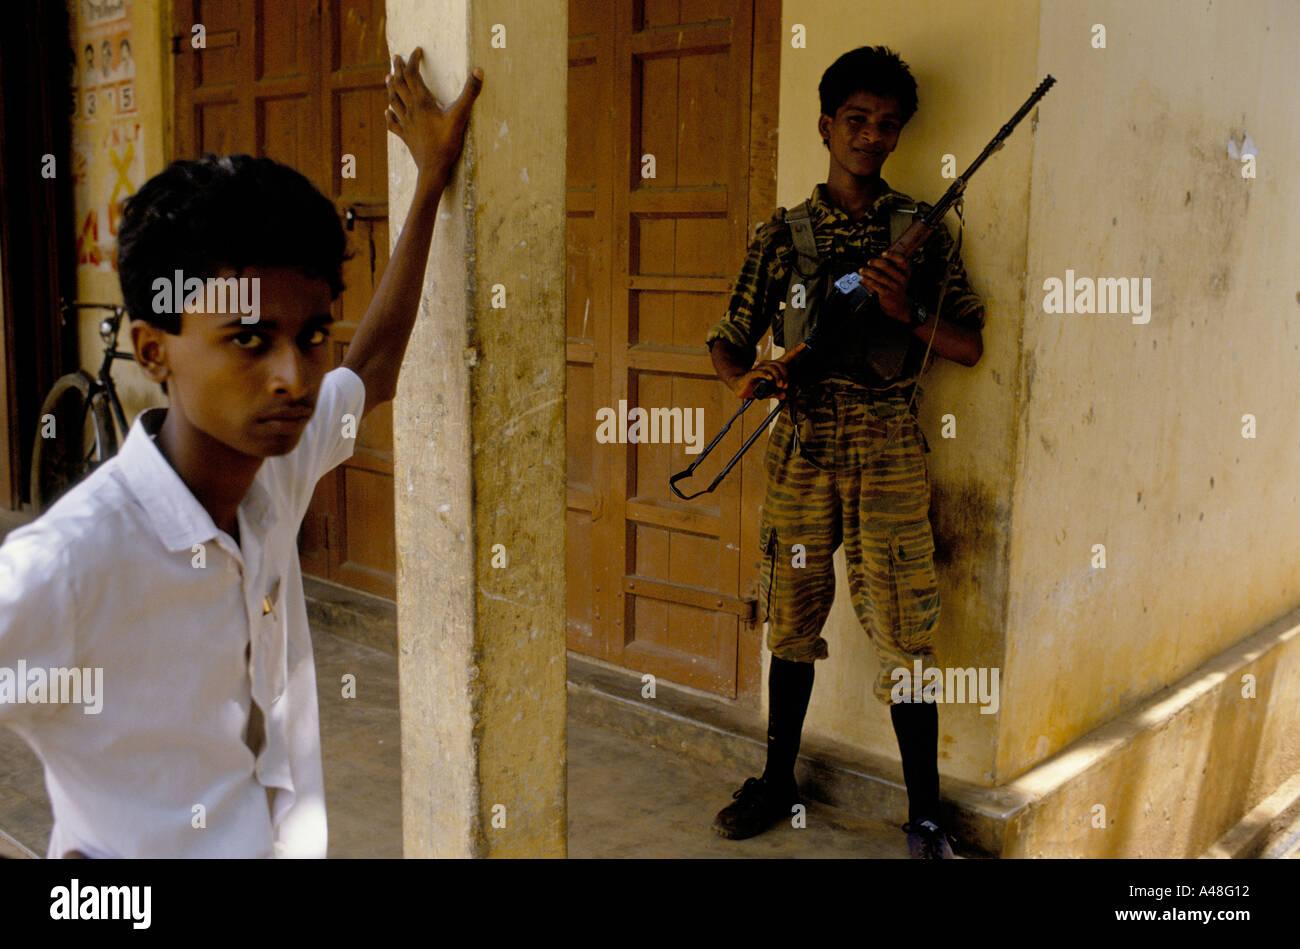 A 12 year old tamil tiger fighter  Jaffna Sri Lanka - Stock Image